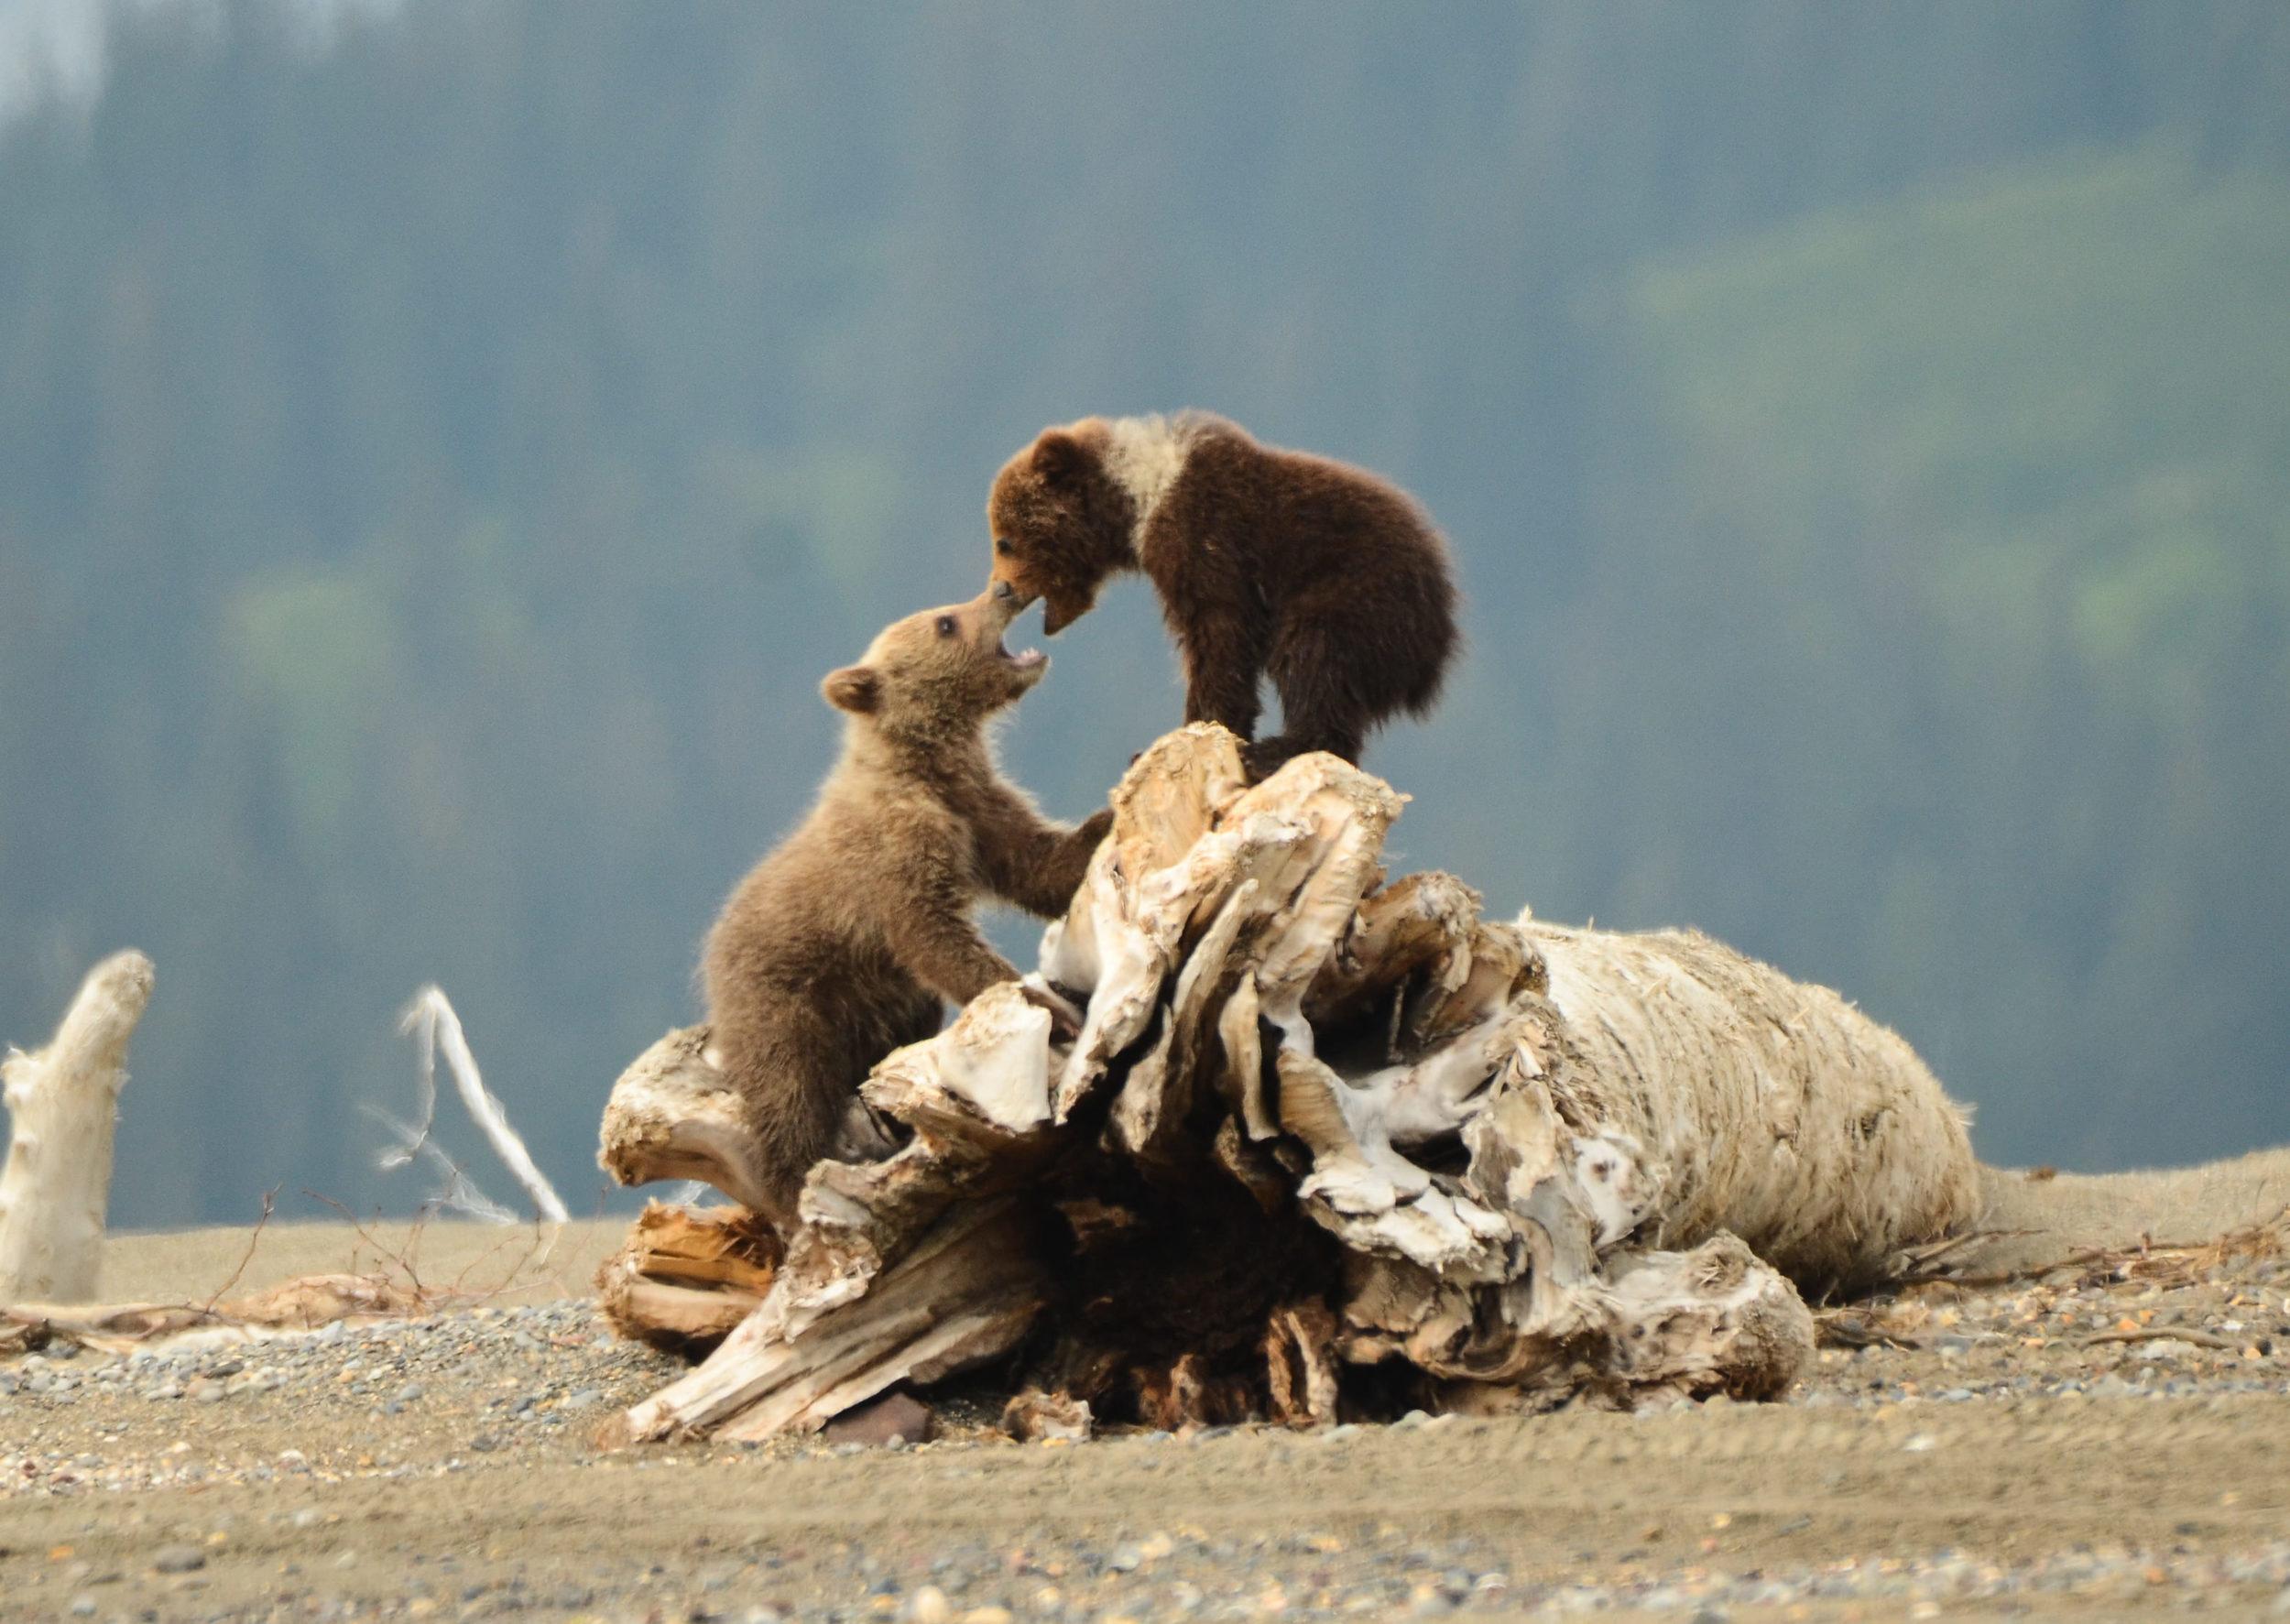 Two Brown Bear Clubs Hard At Play –(PHOTO: DAVIDRASMUS/SHUTTERSTOCK)